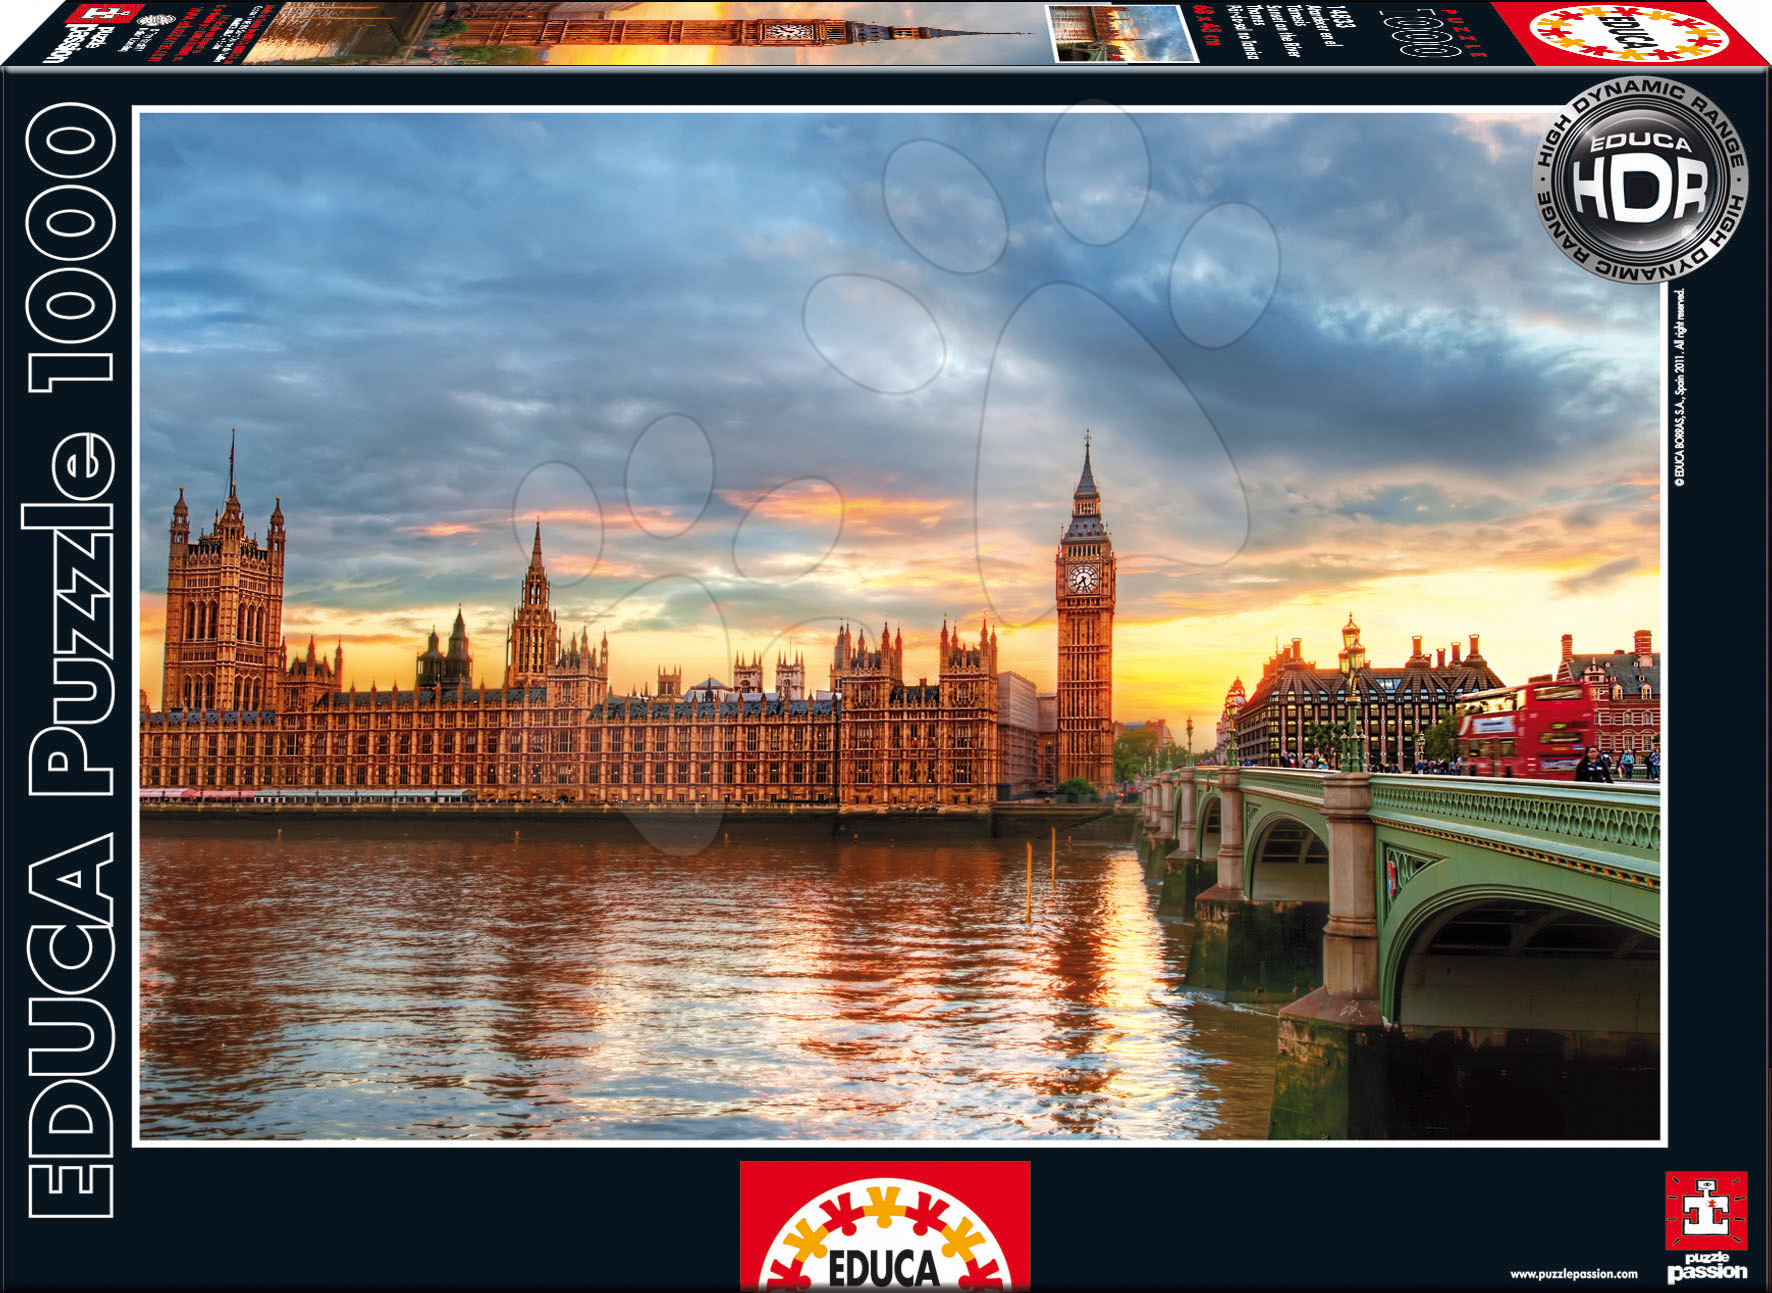 Puzzle 1000 dílků - Puzzle Sunset on the river Thames / London / Educa 1000 dílků a FIX PUZZLE LEPIDLO